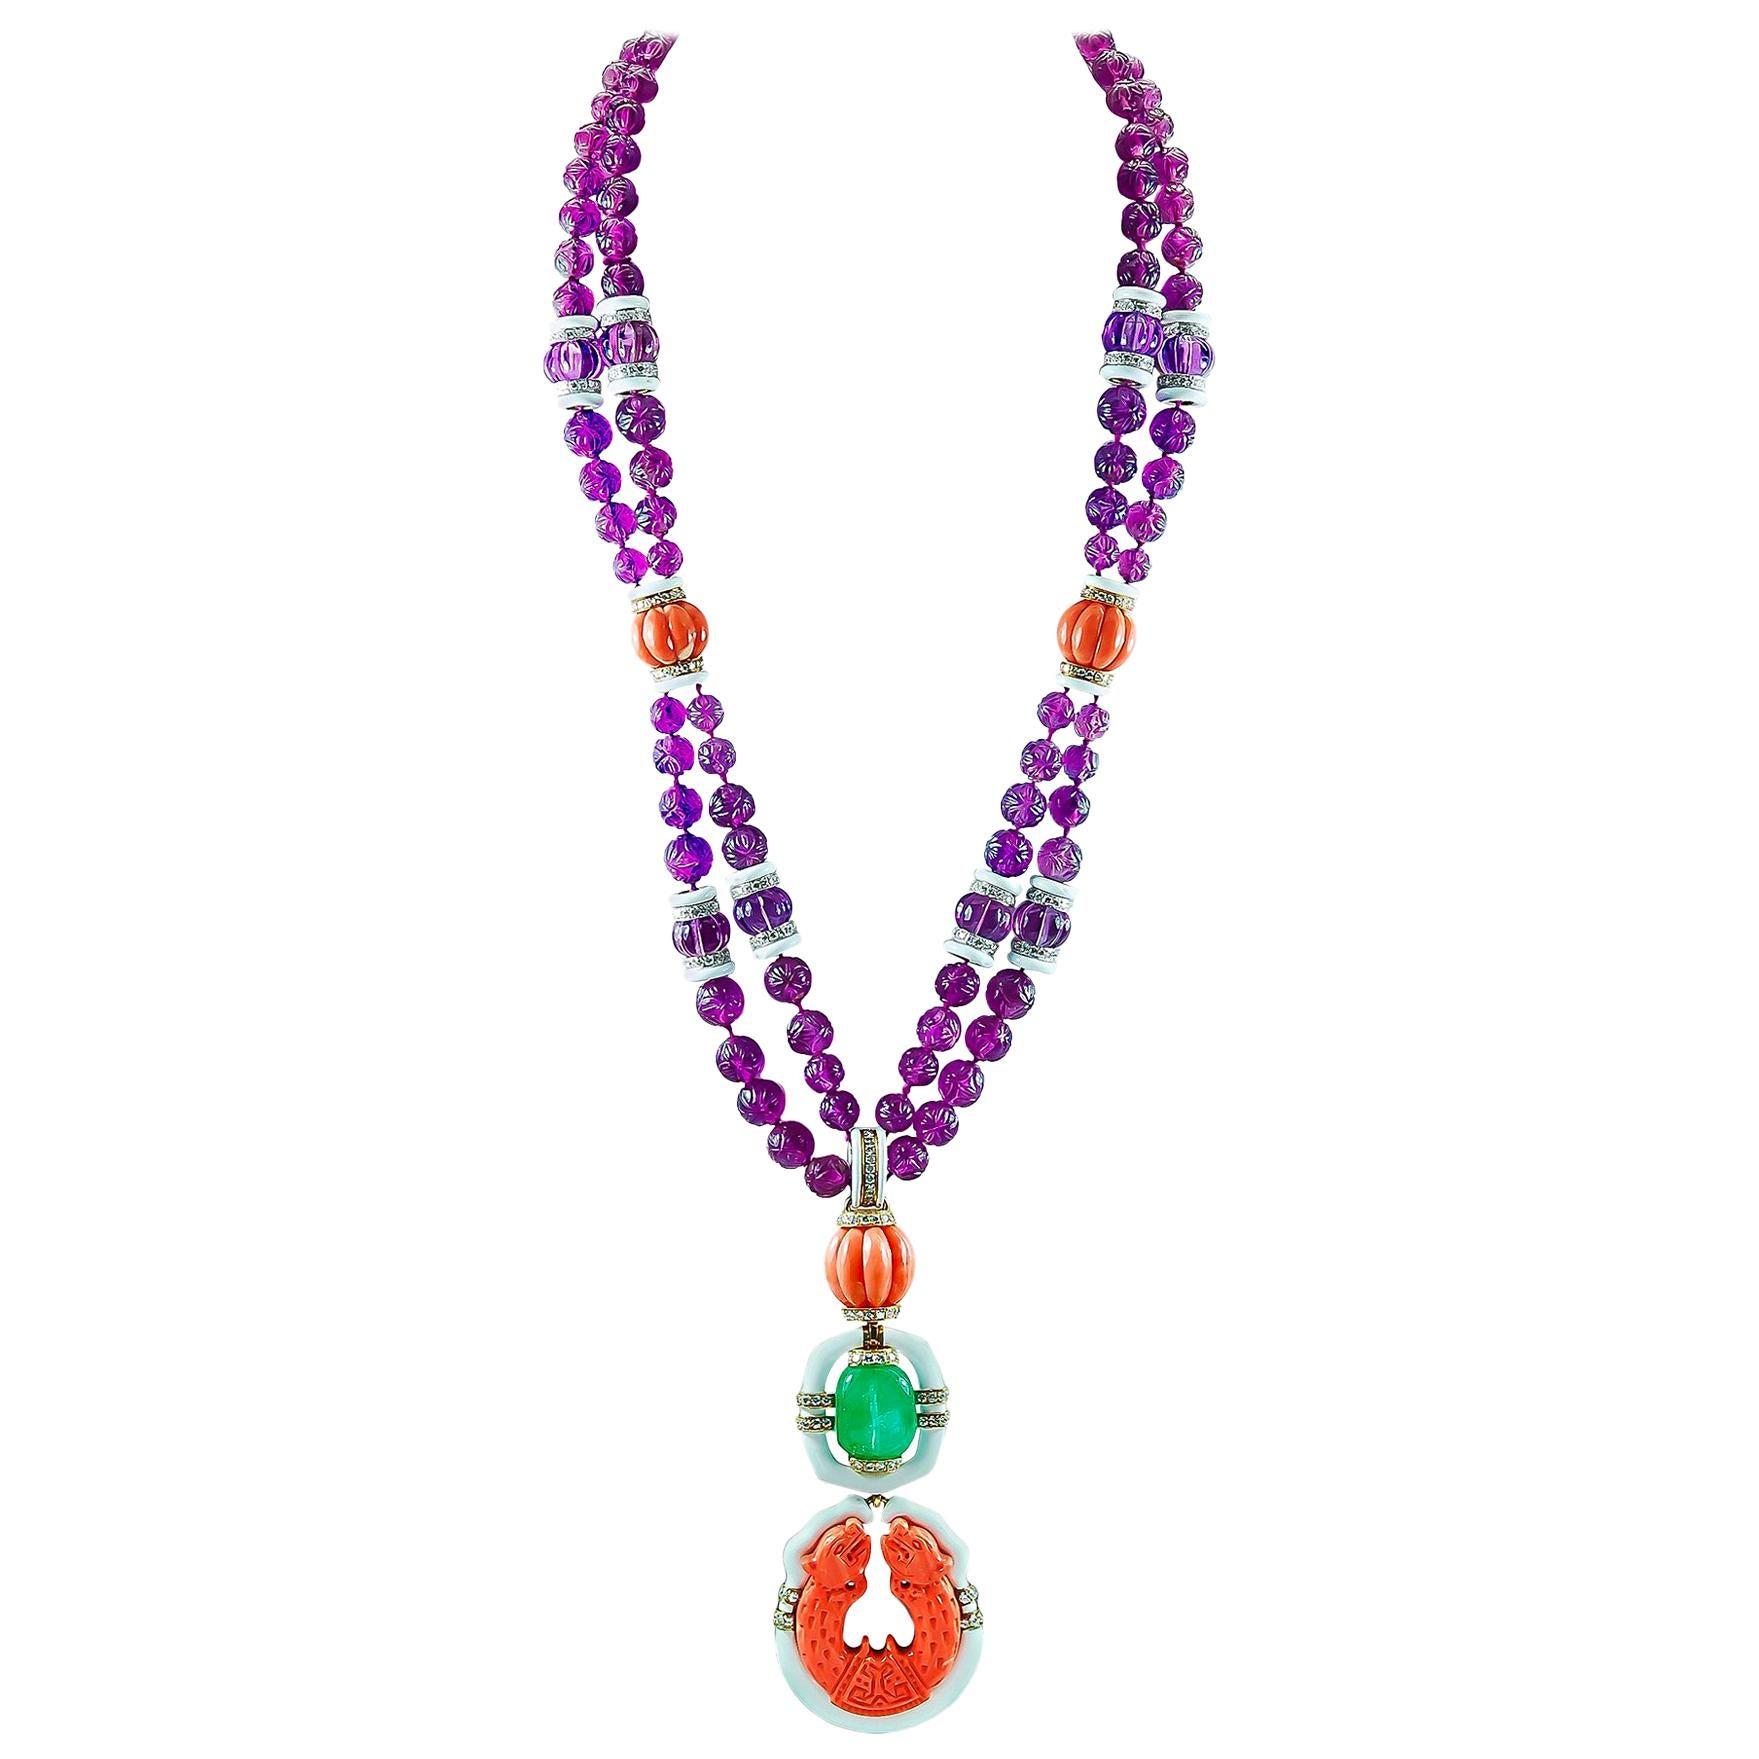 David Webb Carved Amethyst Beads, Diamond, Coral, Emerald Pendant Necklace